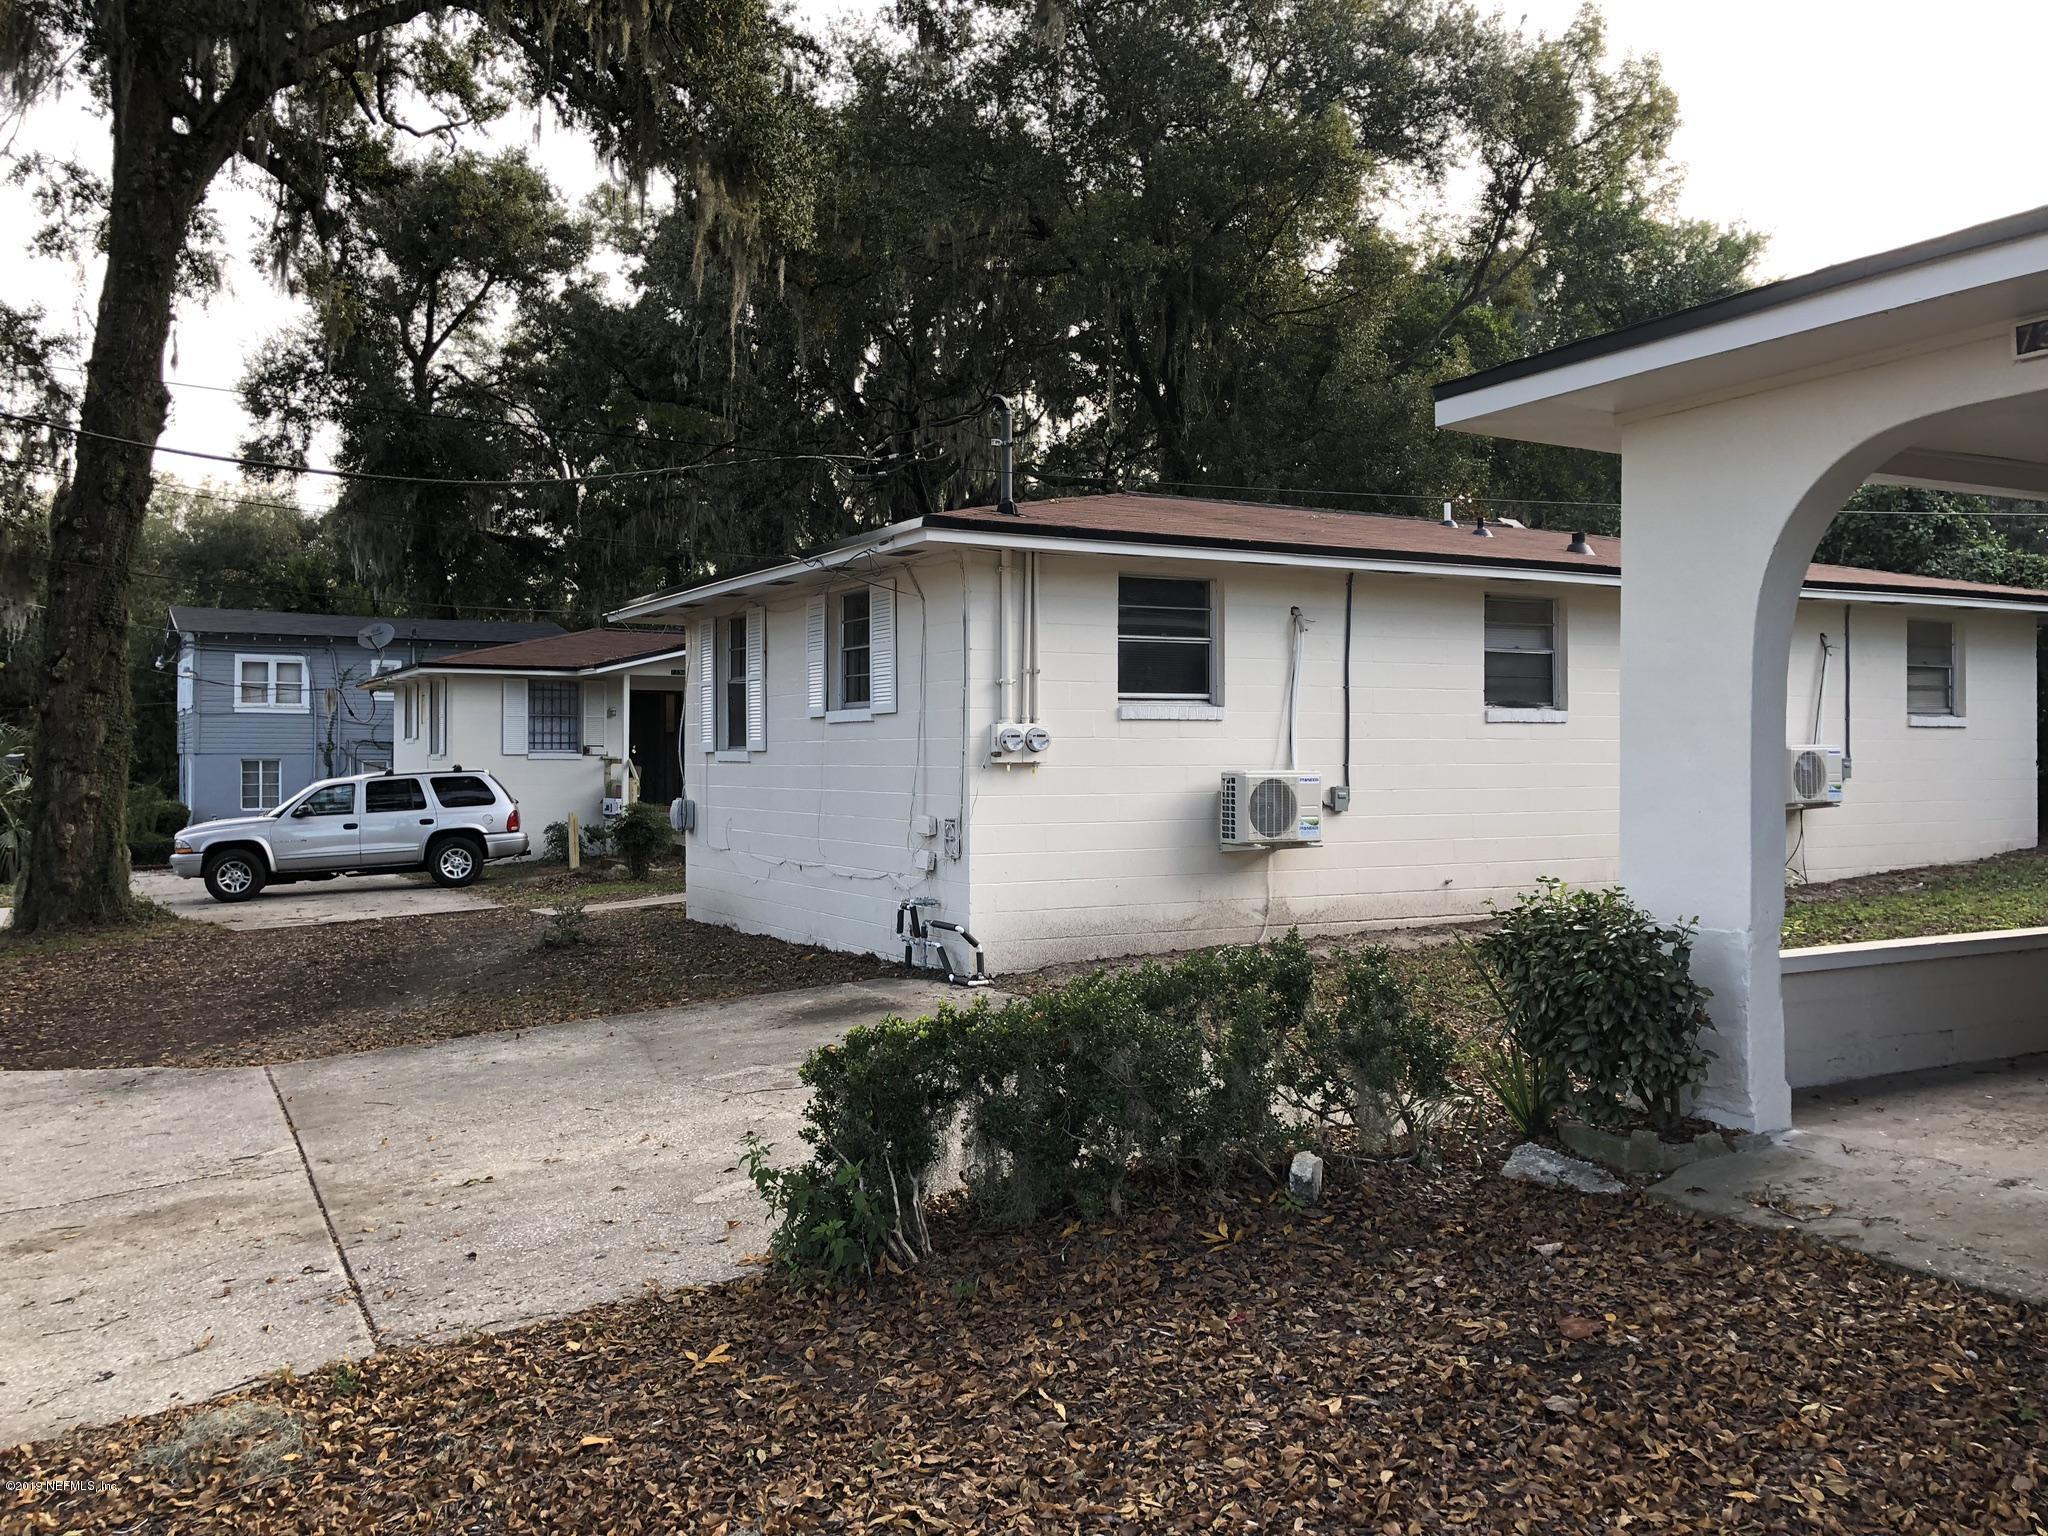 7350 LINDA, JACKSONVILLE, FLORIDA 32208, 6 Bedrooms Bedrooms, ,6 BathroomsBathrooms,Commercial,For sale,LINDA,973018